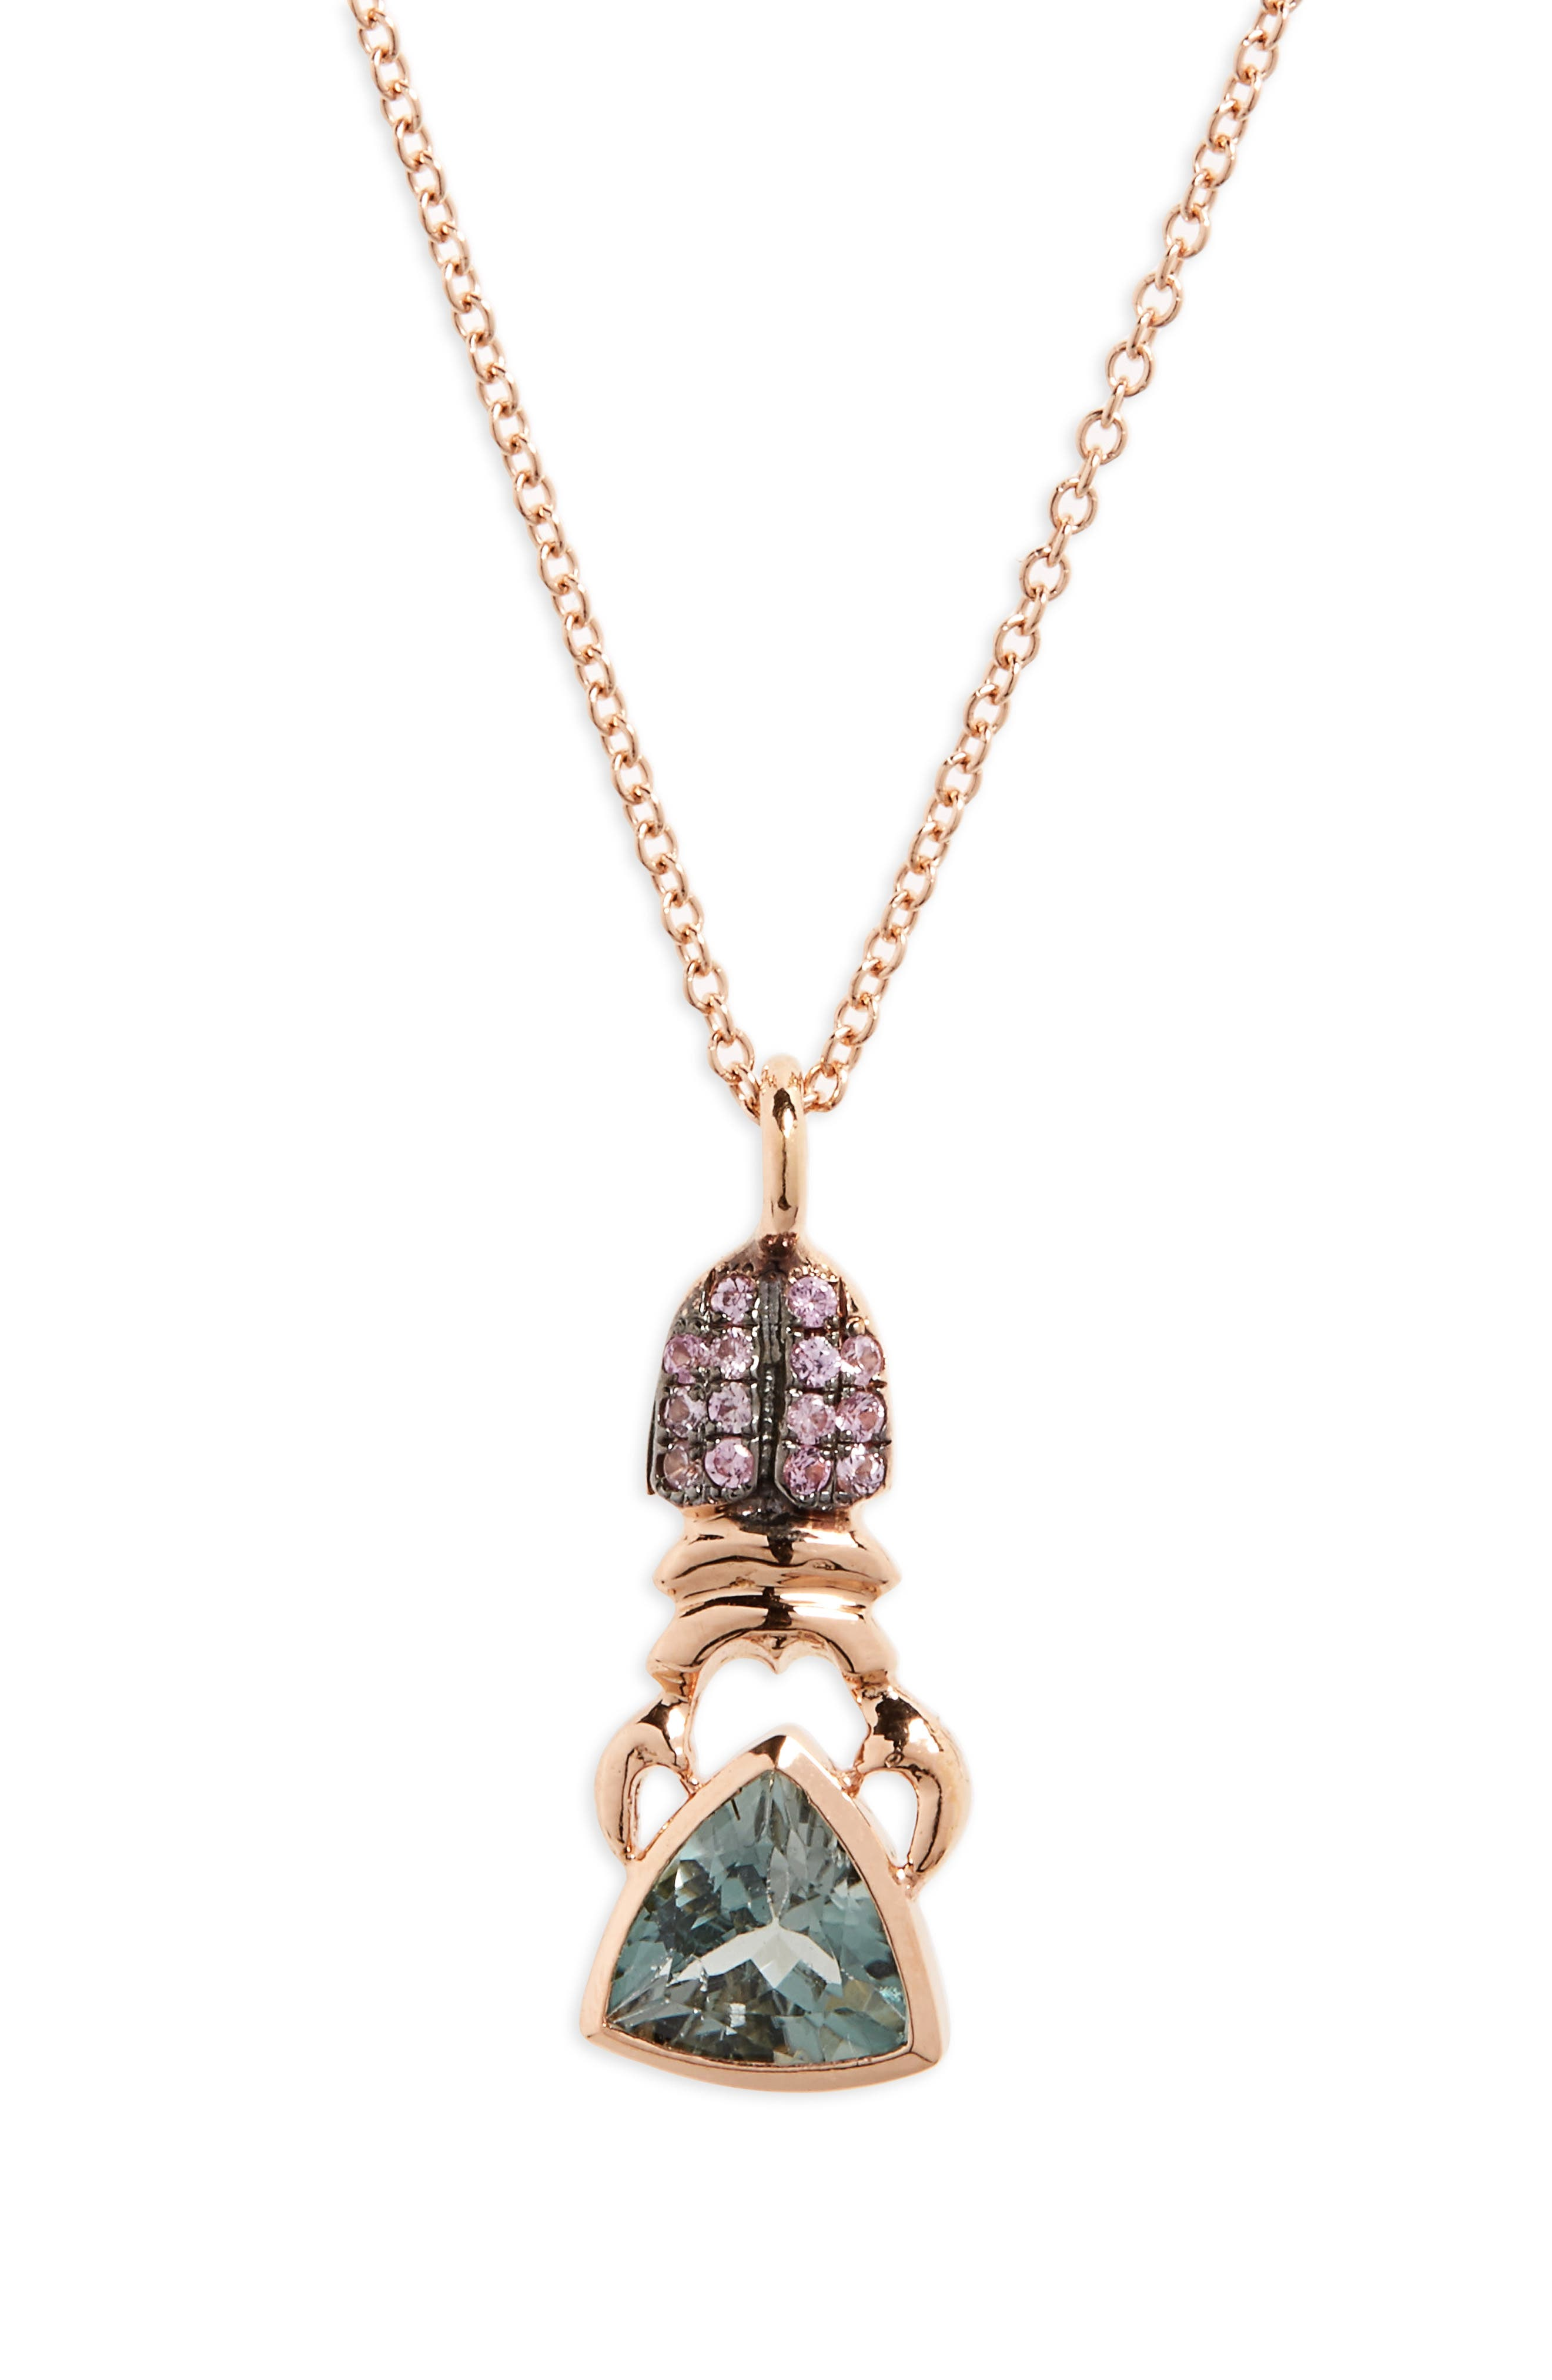 Alternate Image 1 Selected - Daniela Villegas Khepri Sapphire Pendant Necklace